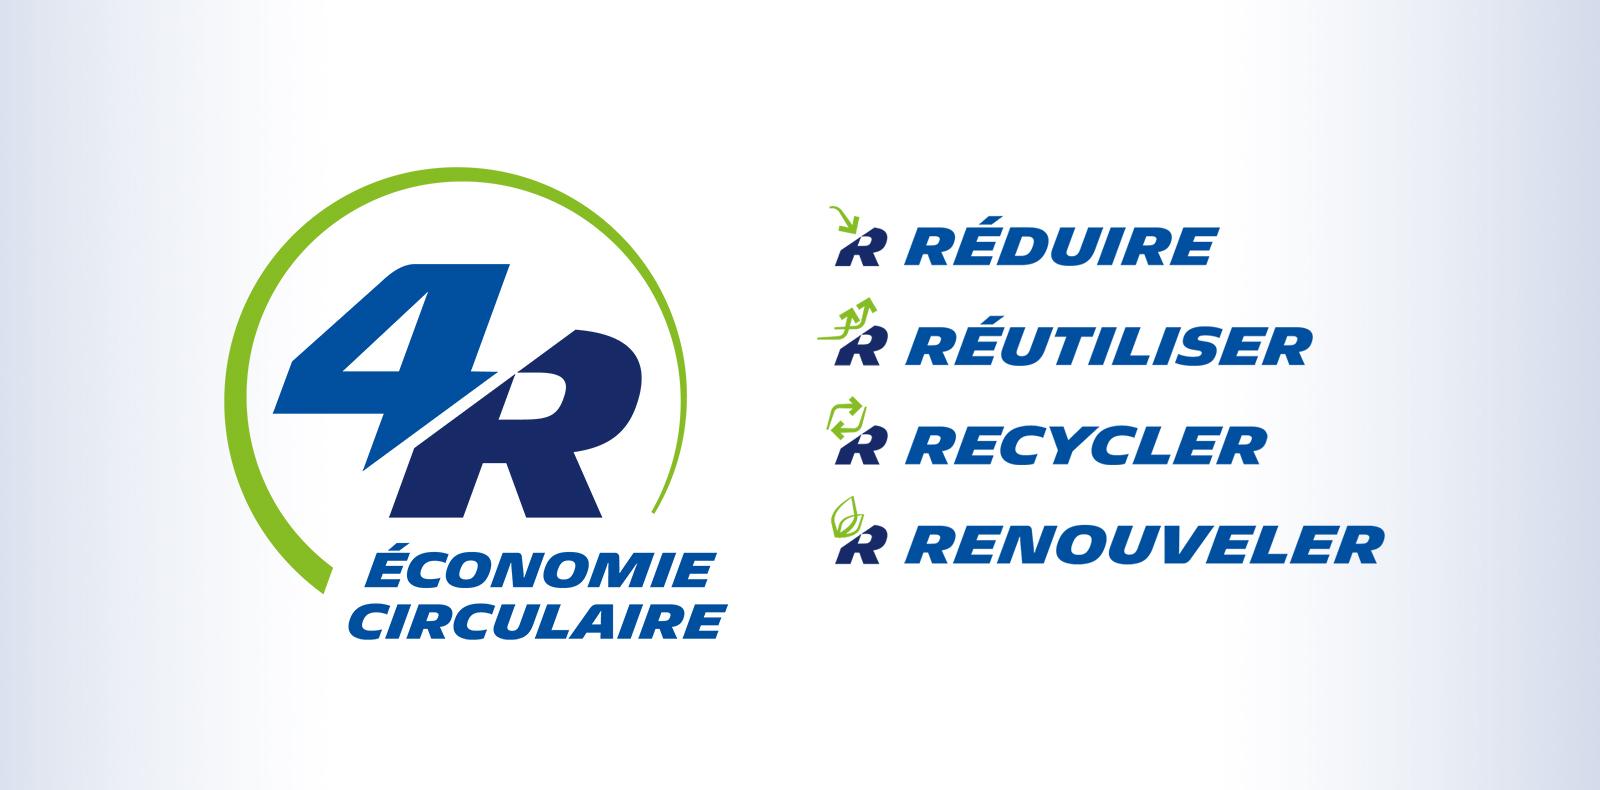 actu_recyclage_4r-fr_1600x790